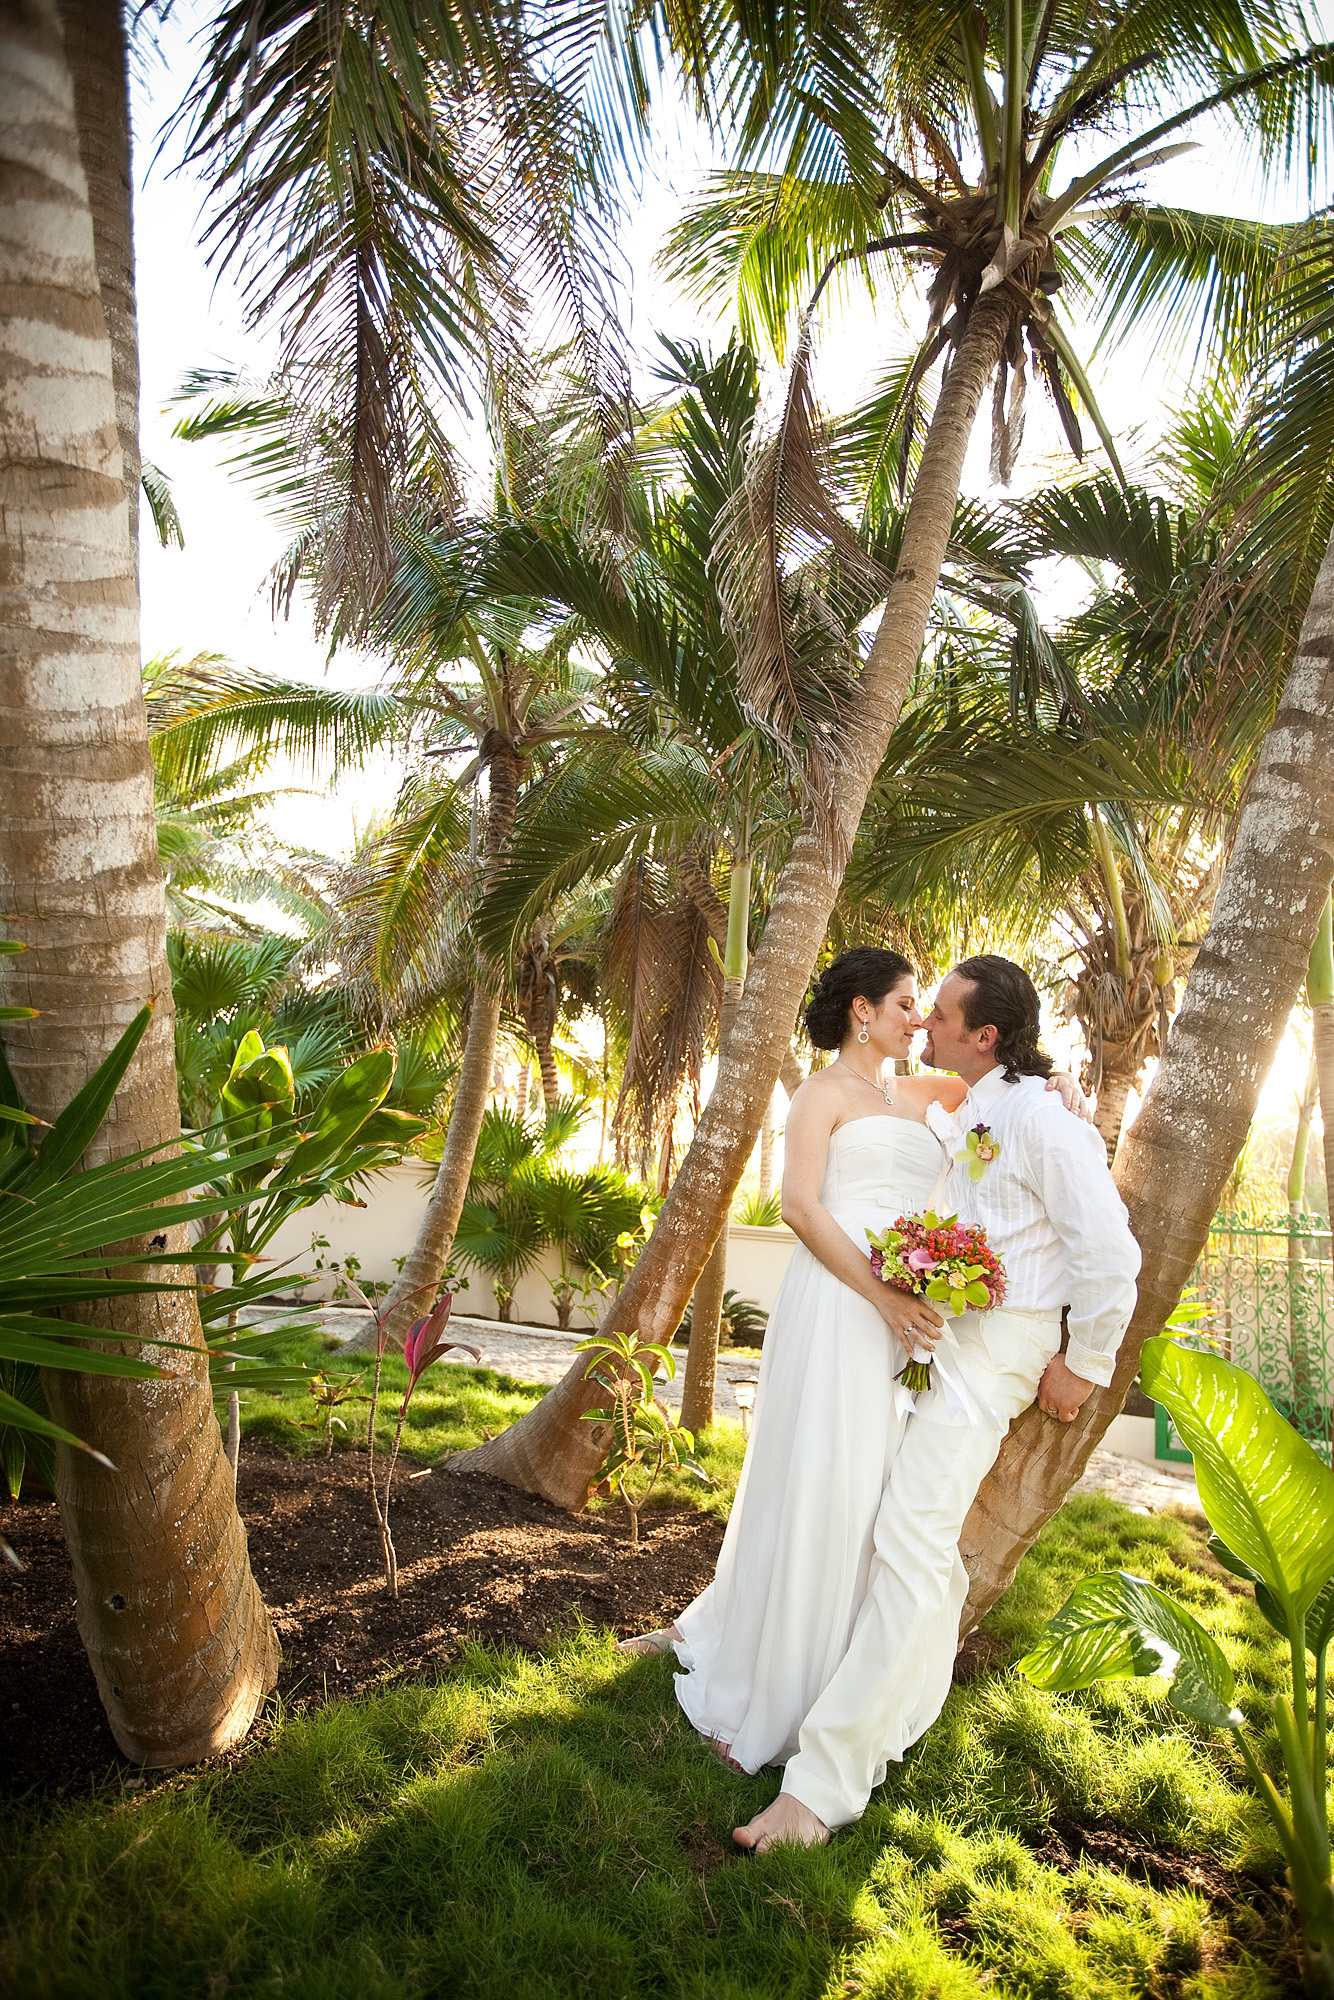 Destinations, Mexico, Beach, Wedding